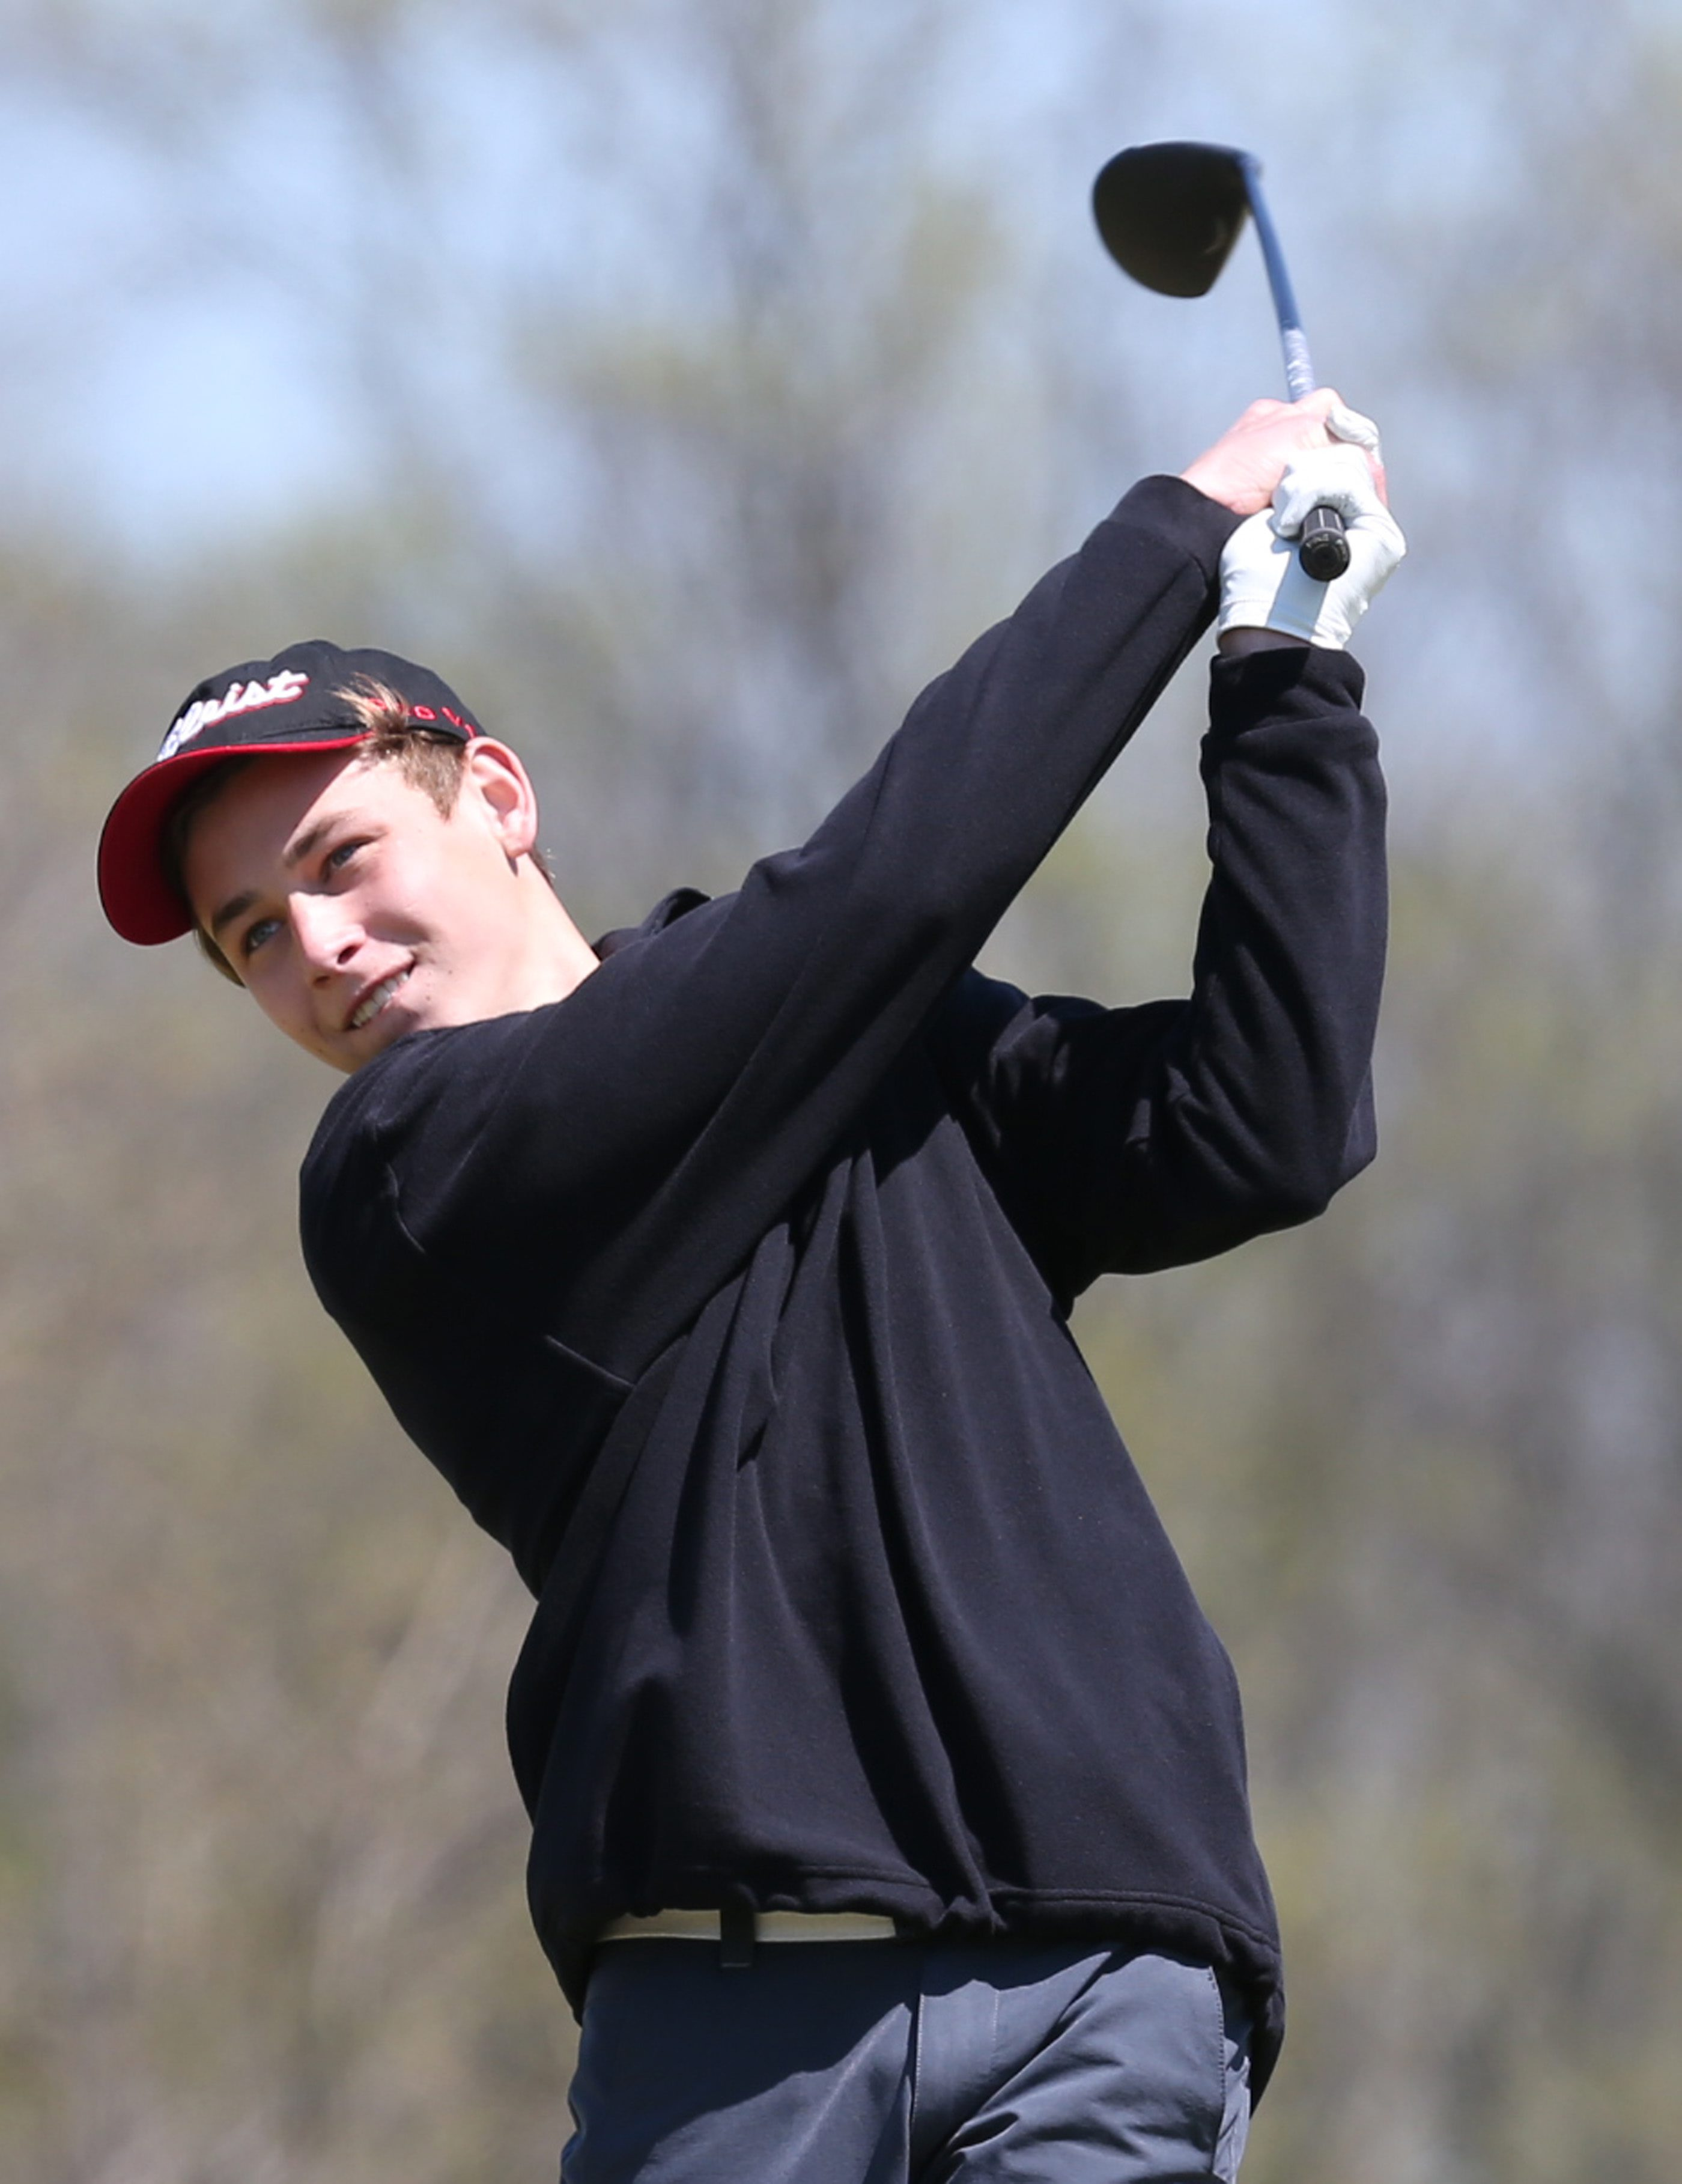 Matt Pawlak of Niagara-Wheatfield tees off during the 2015 Section VI golf championships. (James P. McCoy/ Buffalo News)